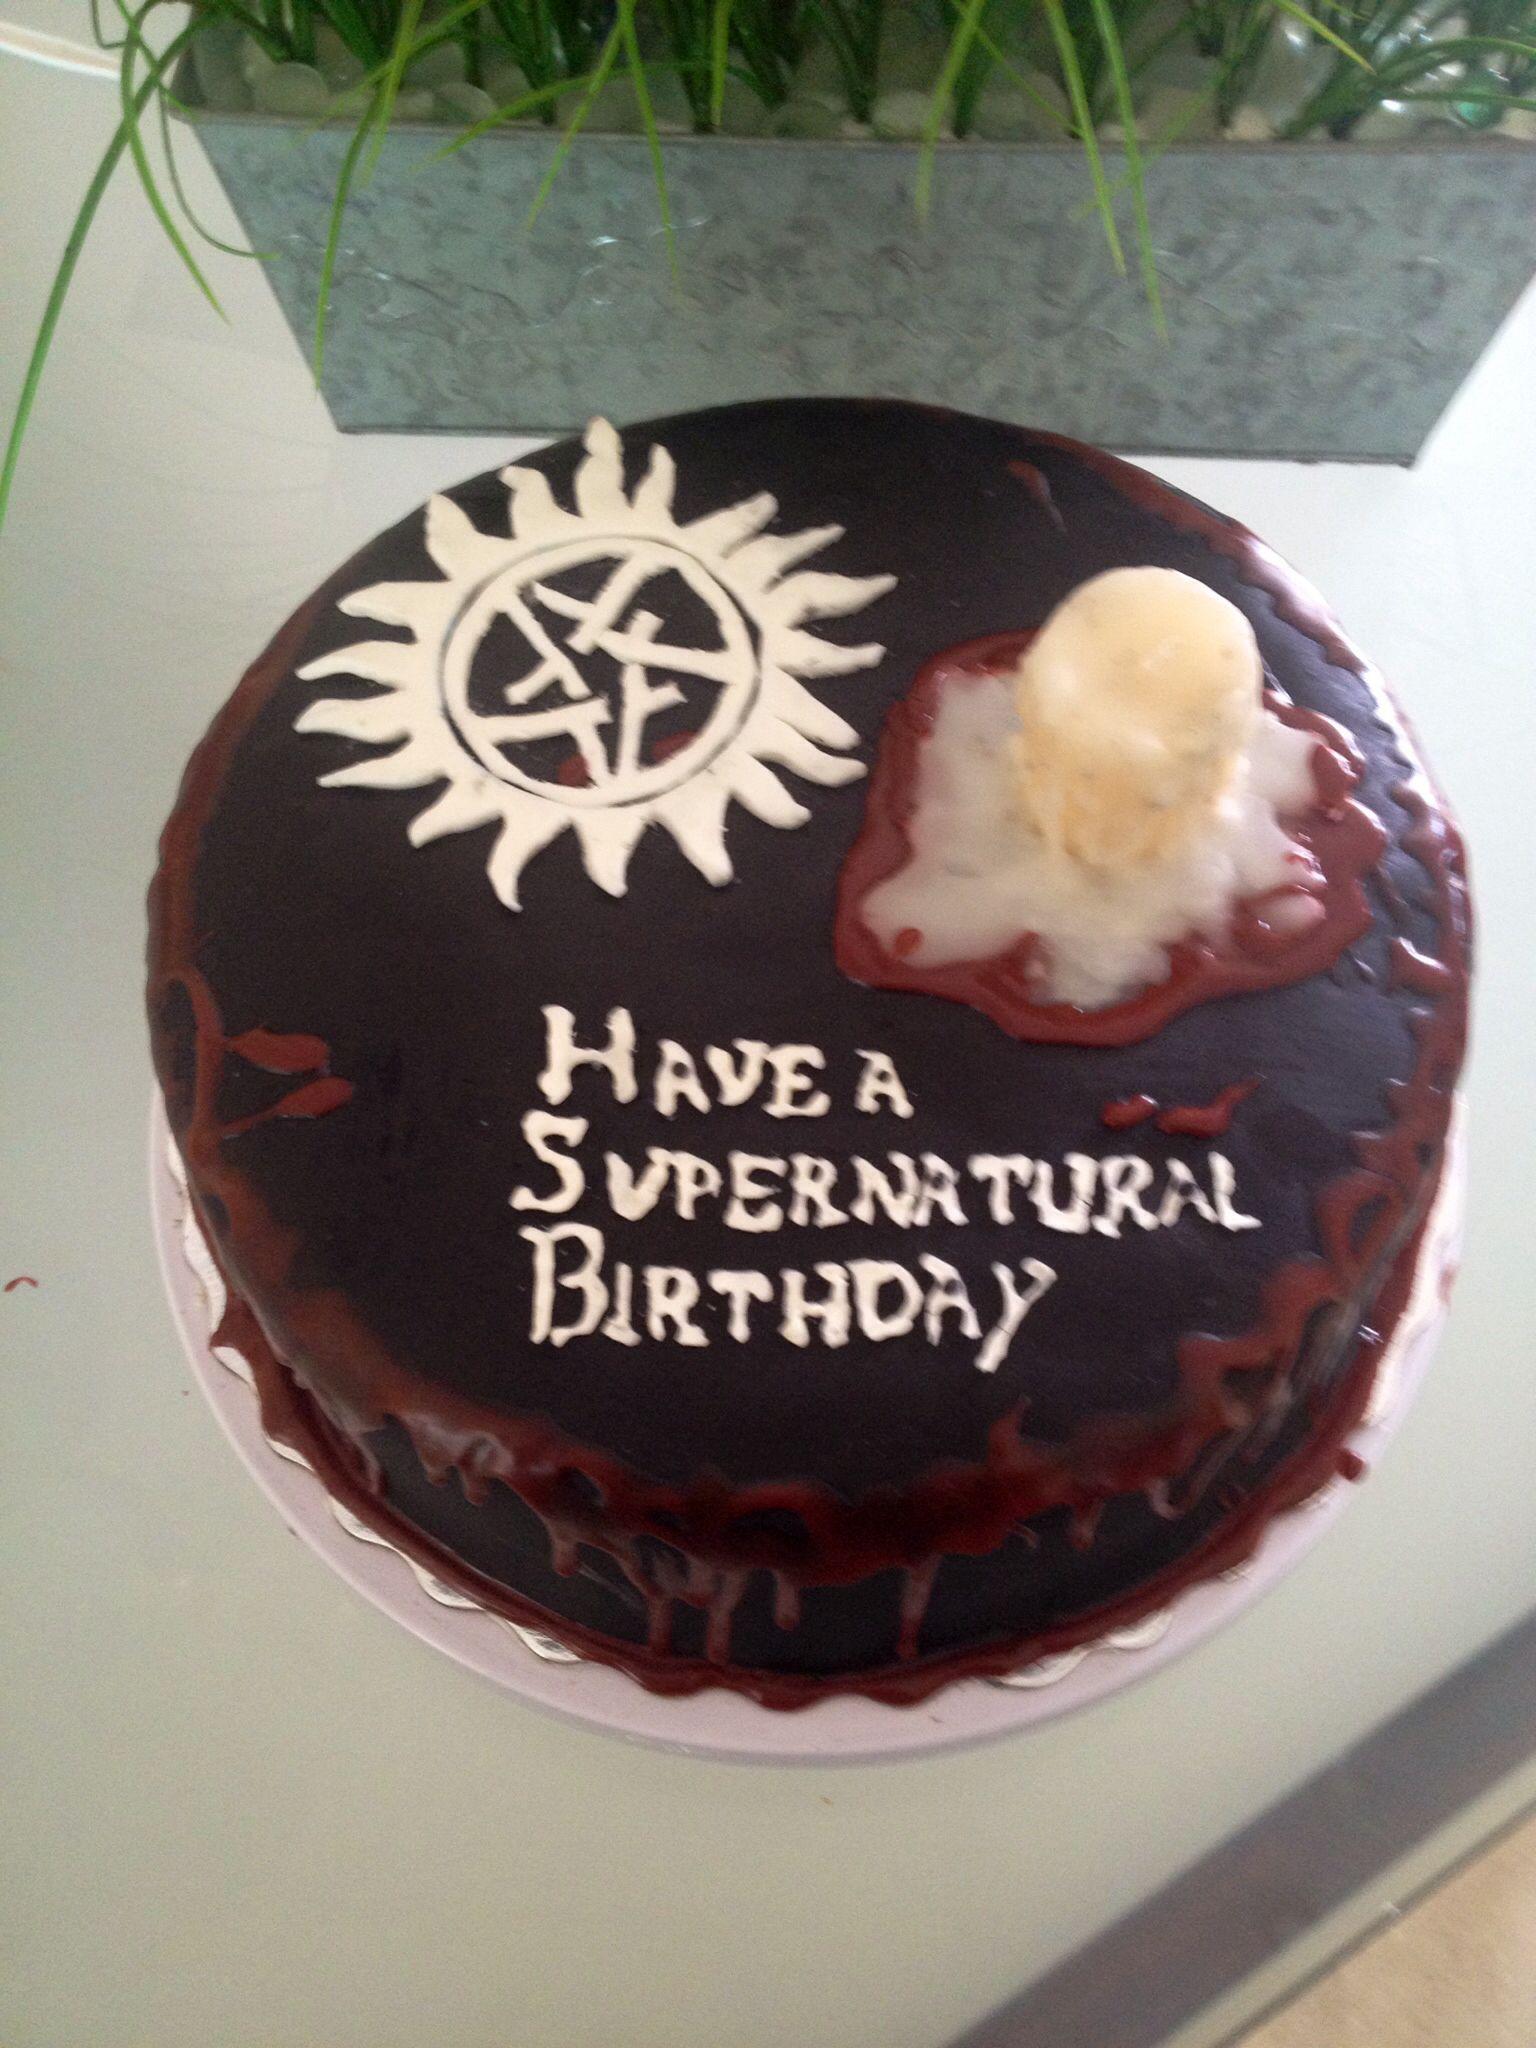 Supernatural cake | Supernatural cake, Supernatural ...